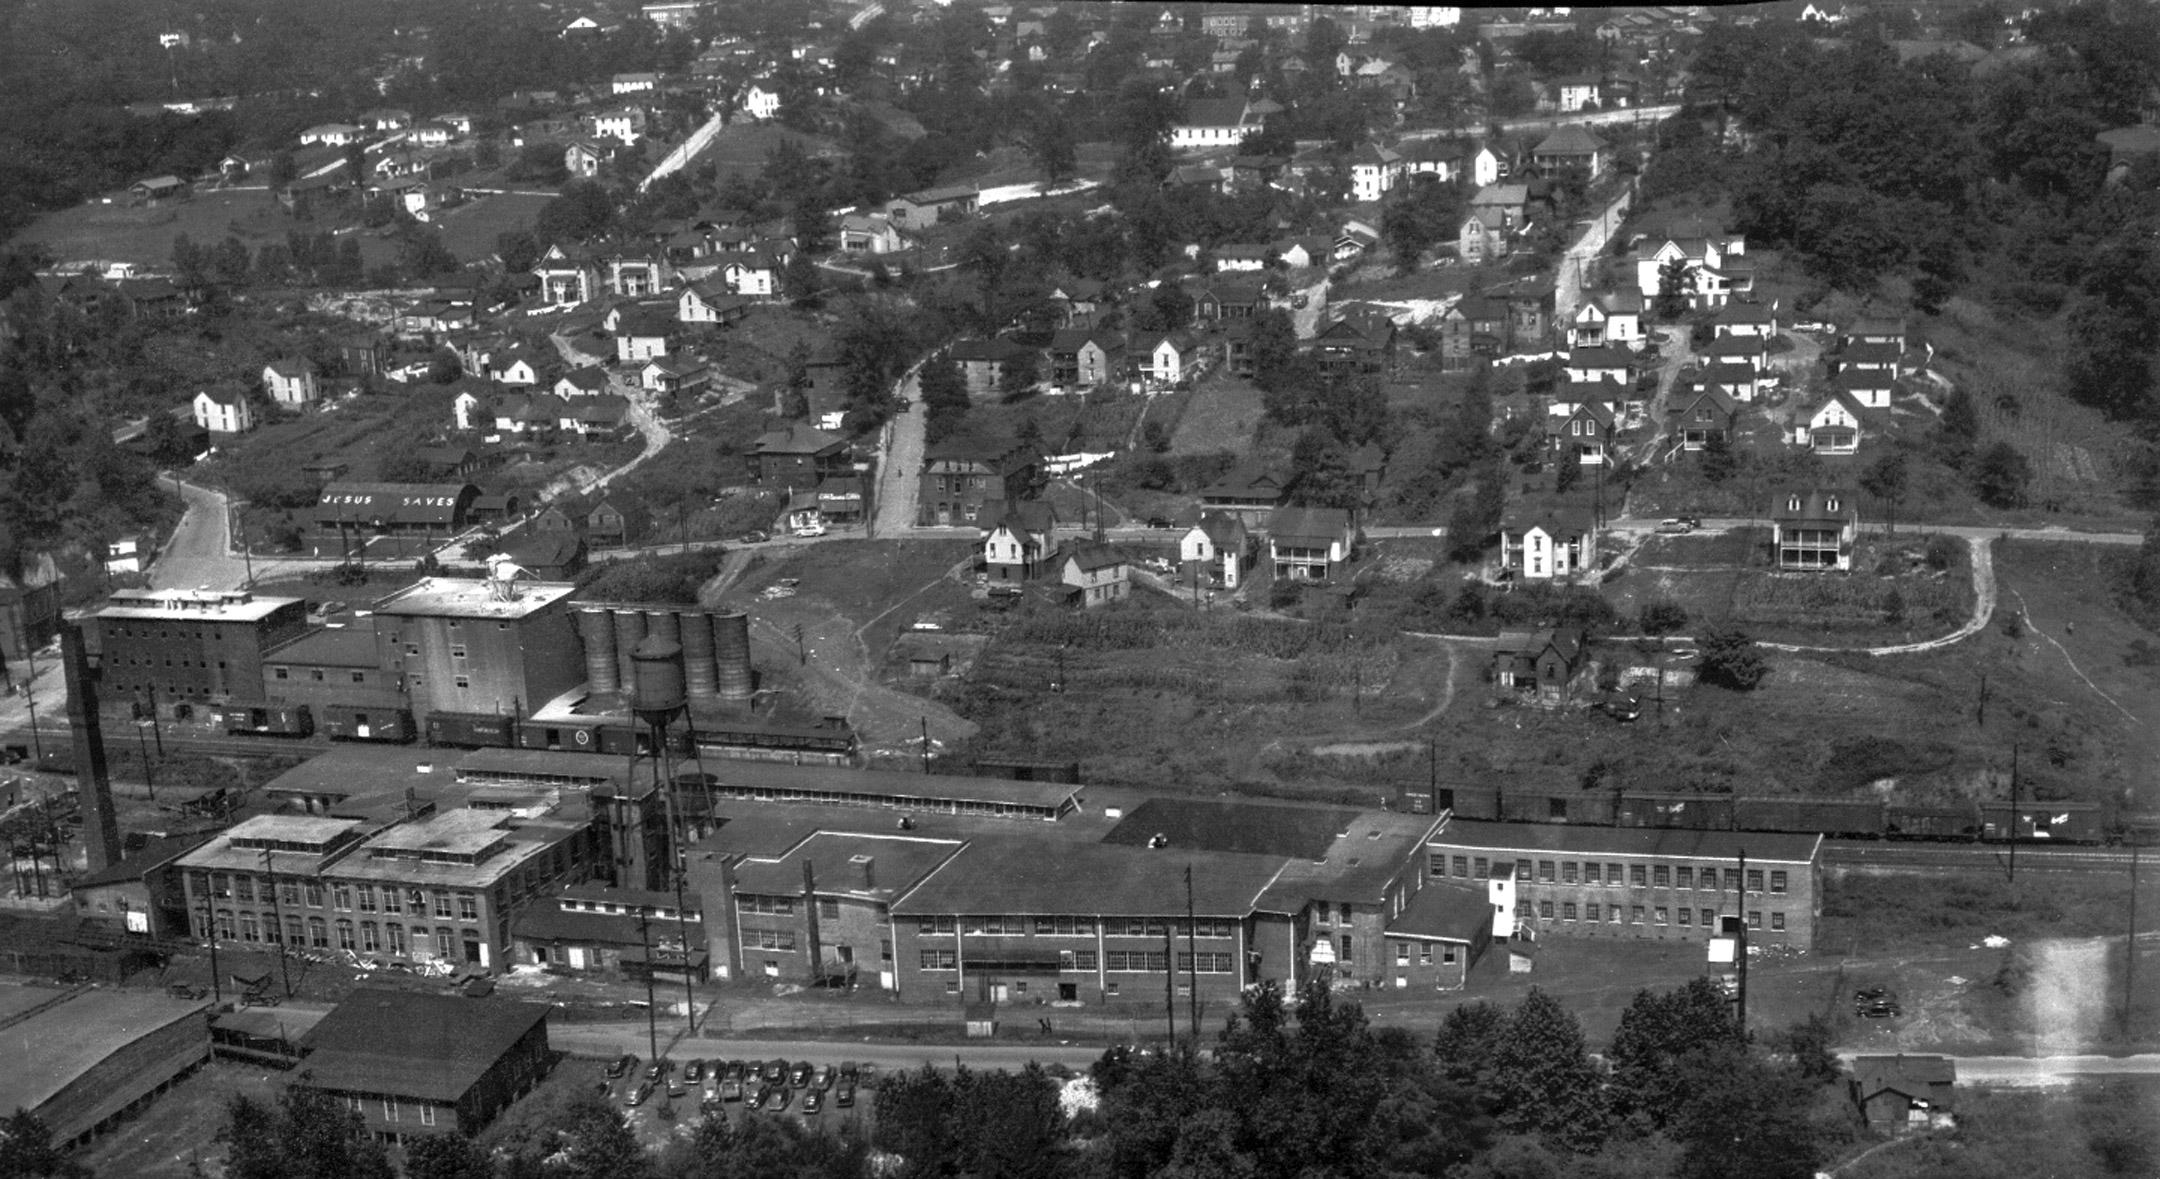 Photo credit: North Carolina Collection, Pack Memorial Public Library, Asheville, North Carolina